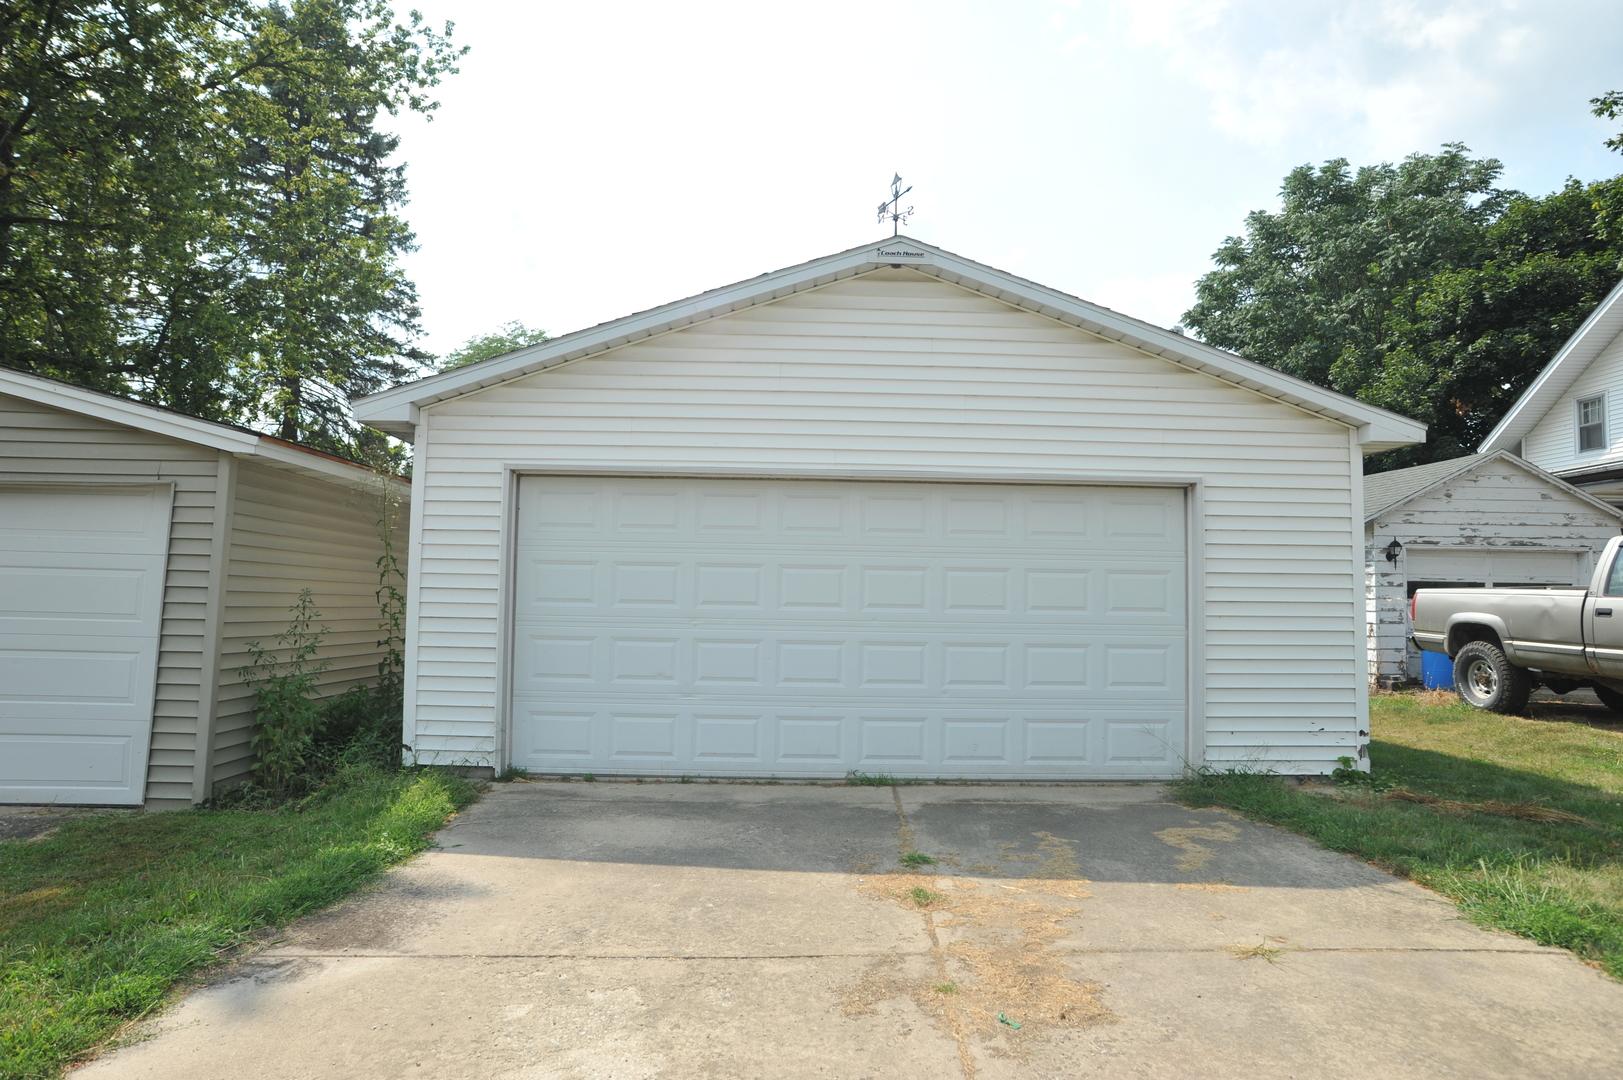 225 South Main, Leland, Illinois, 60531